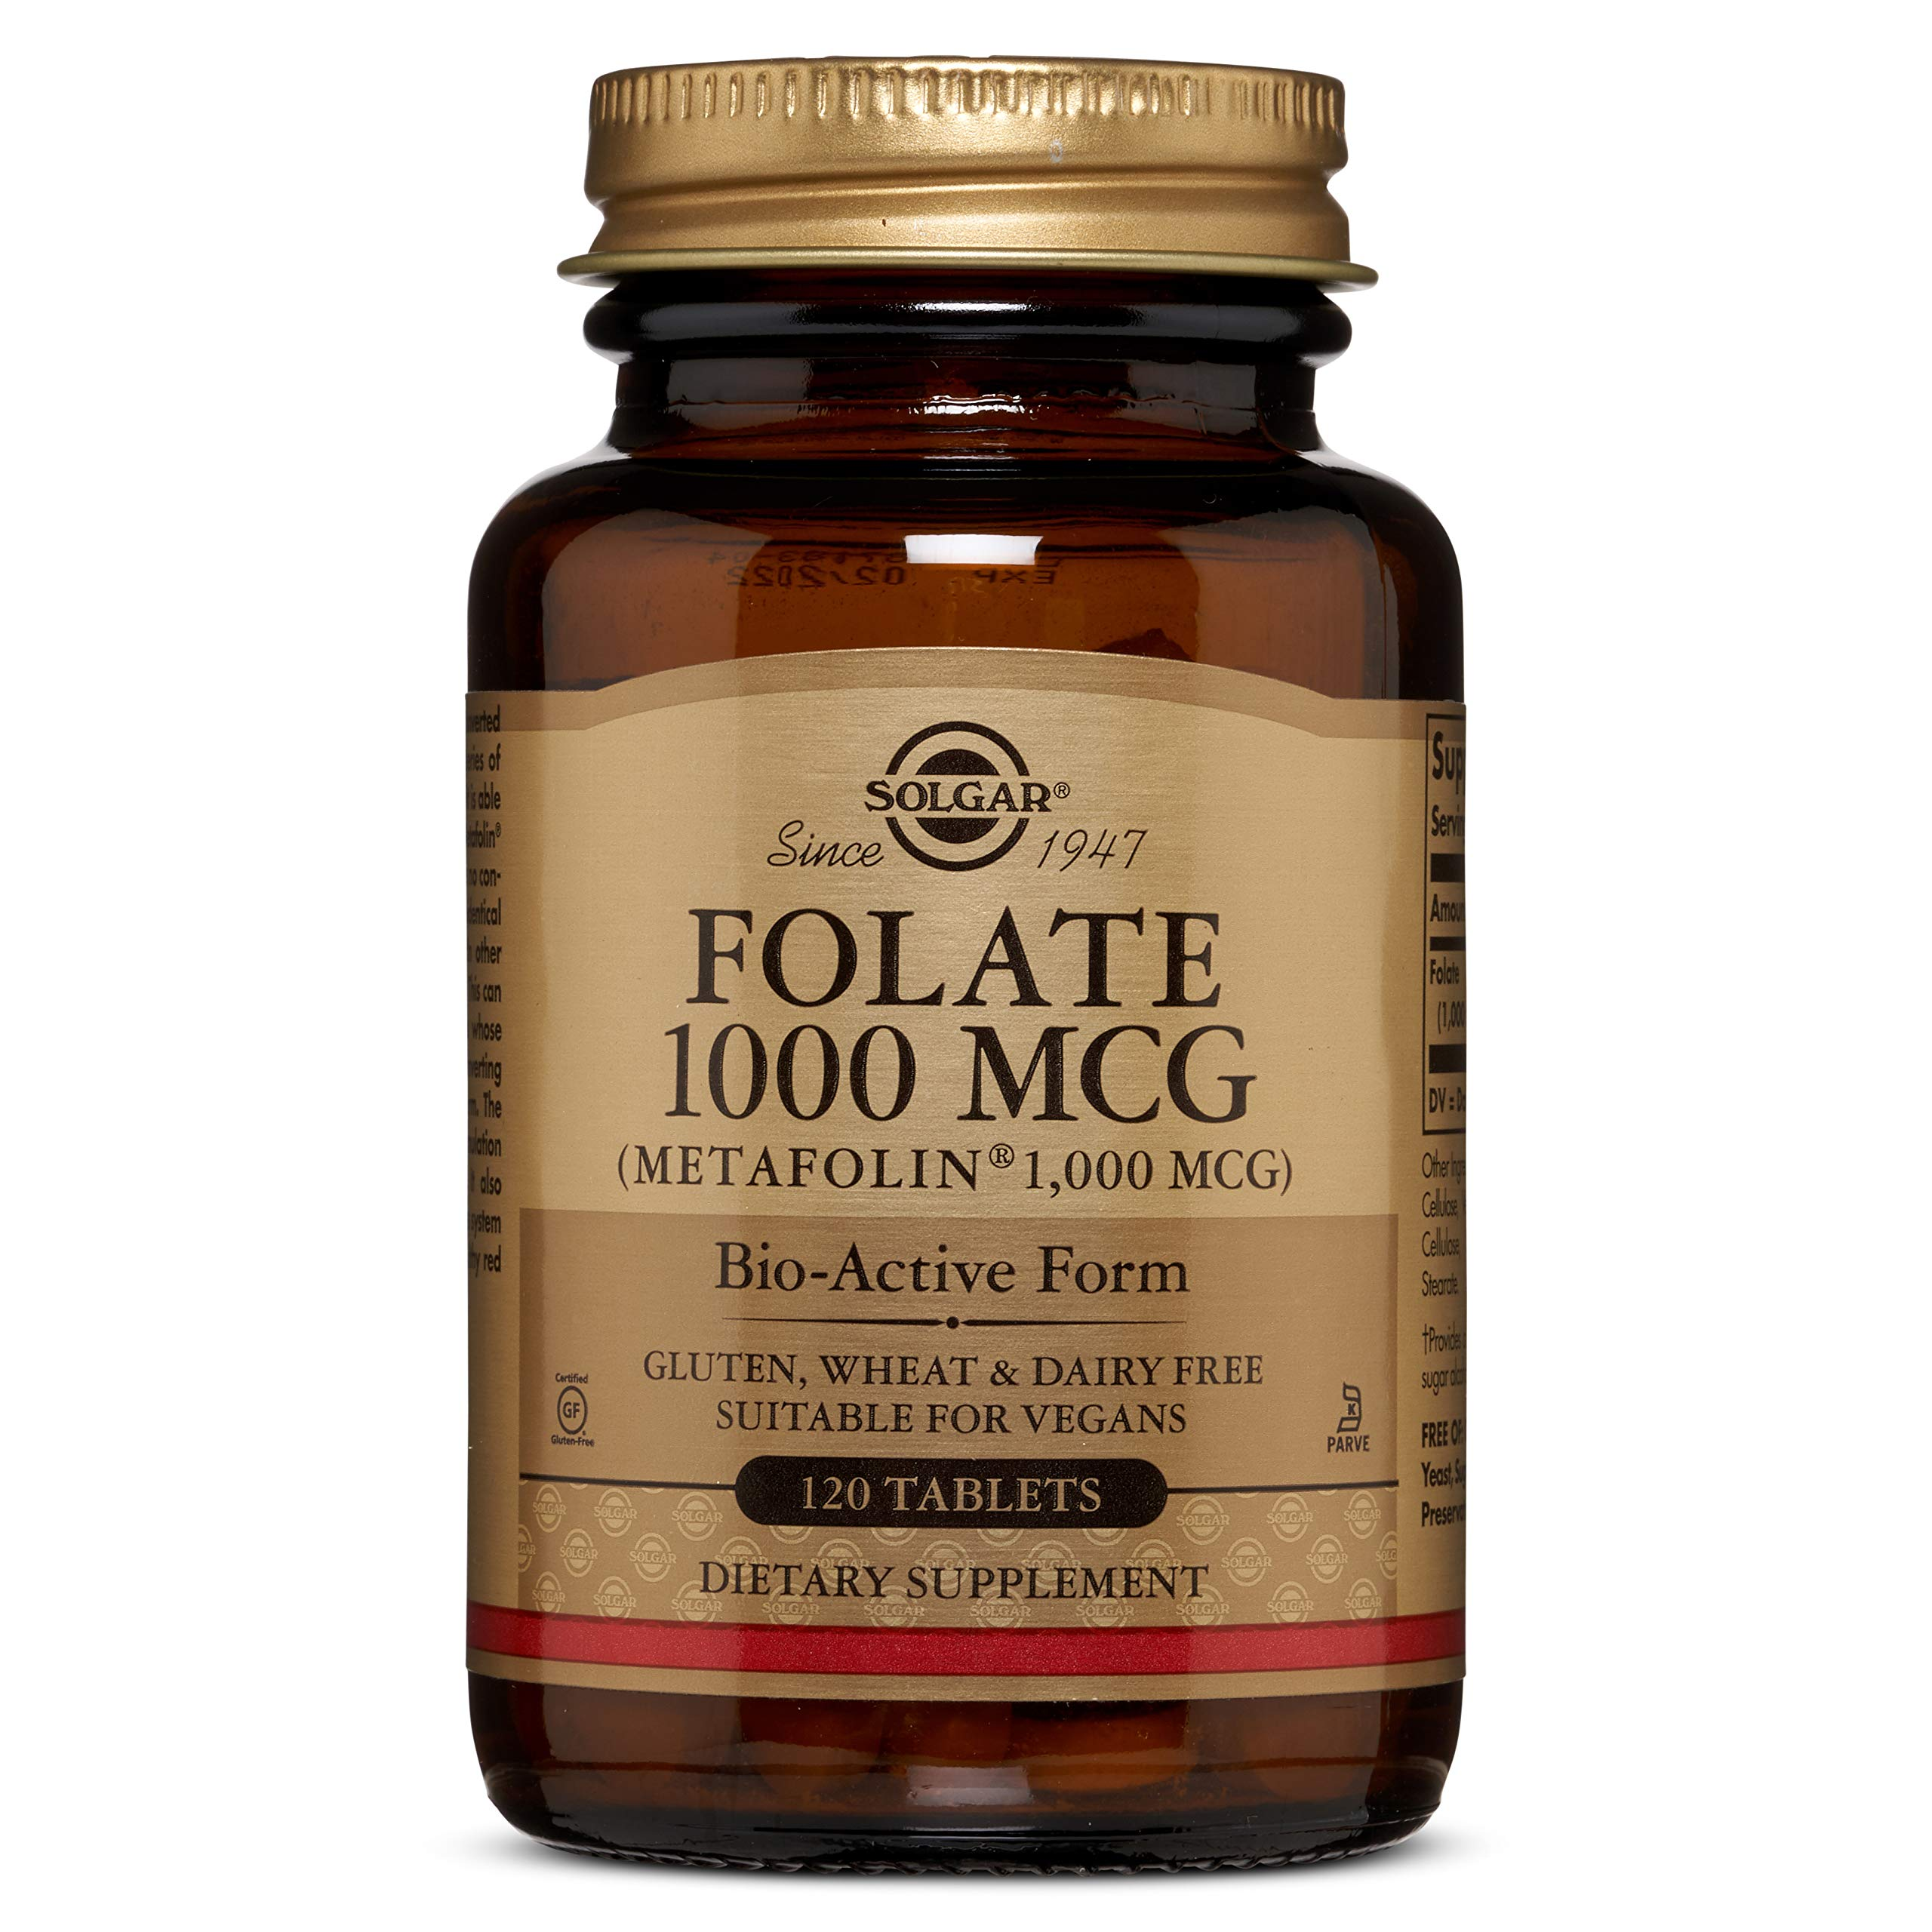 Folate 1000 MCG (Metafolin® 1,000 MCG) Tablets - 120 Count - 2 Pack